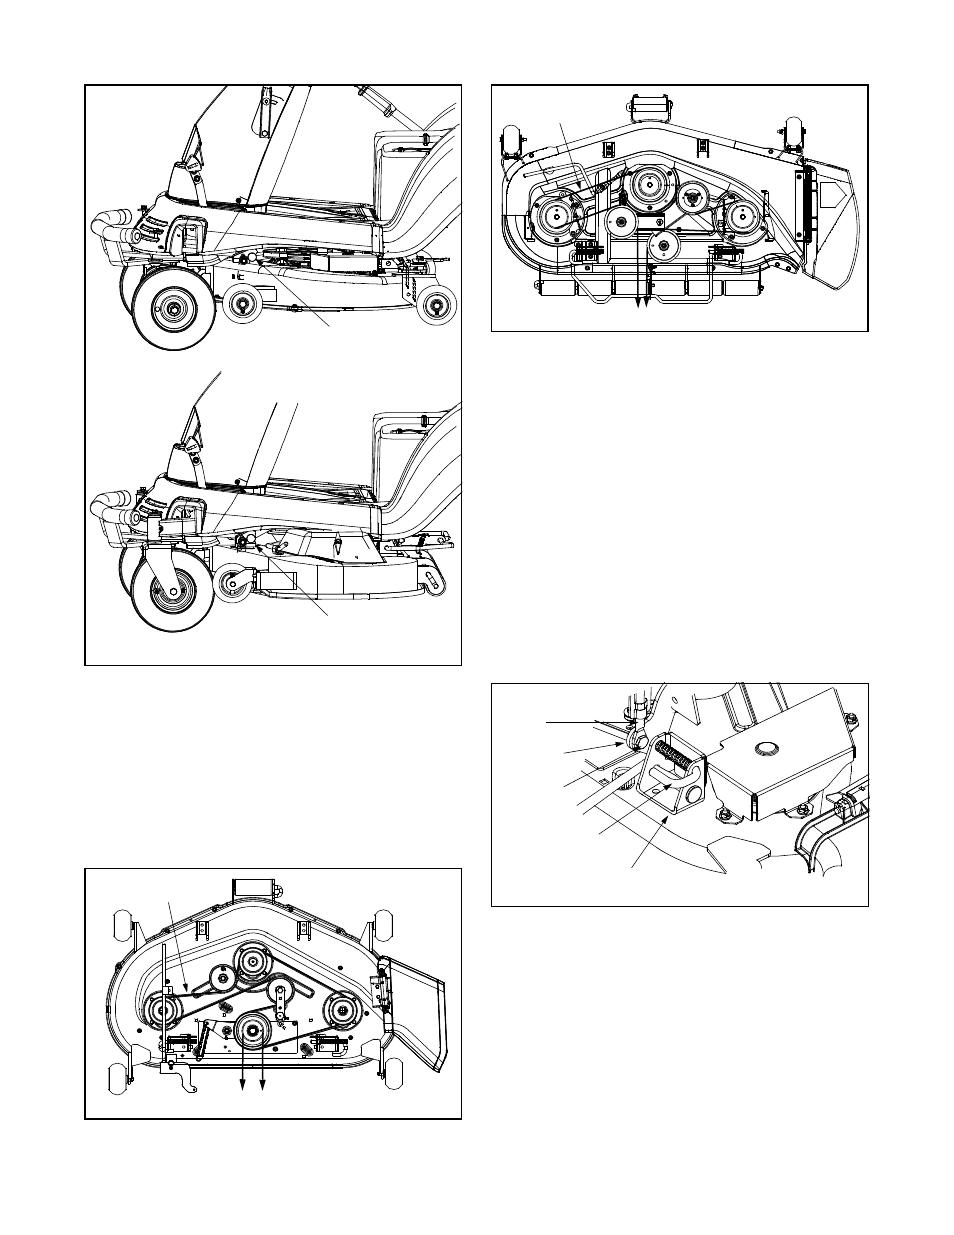 installing mower deck belt  installing the mower deck